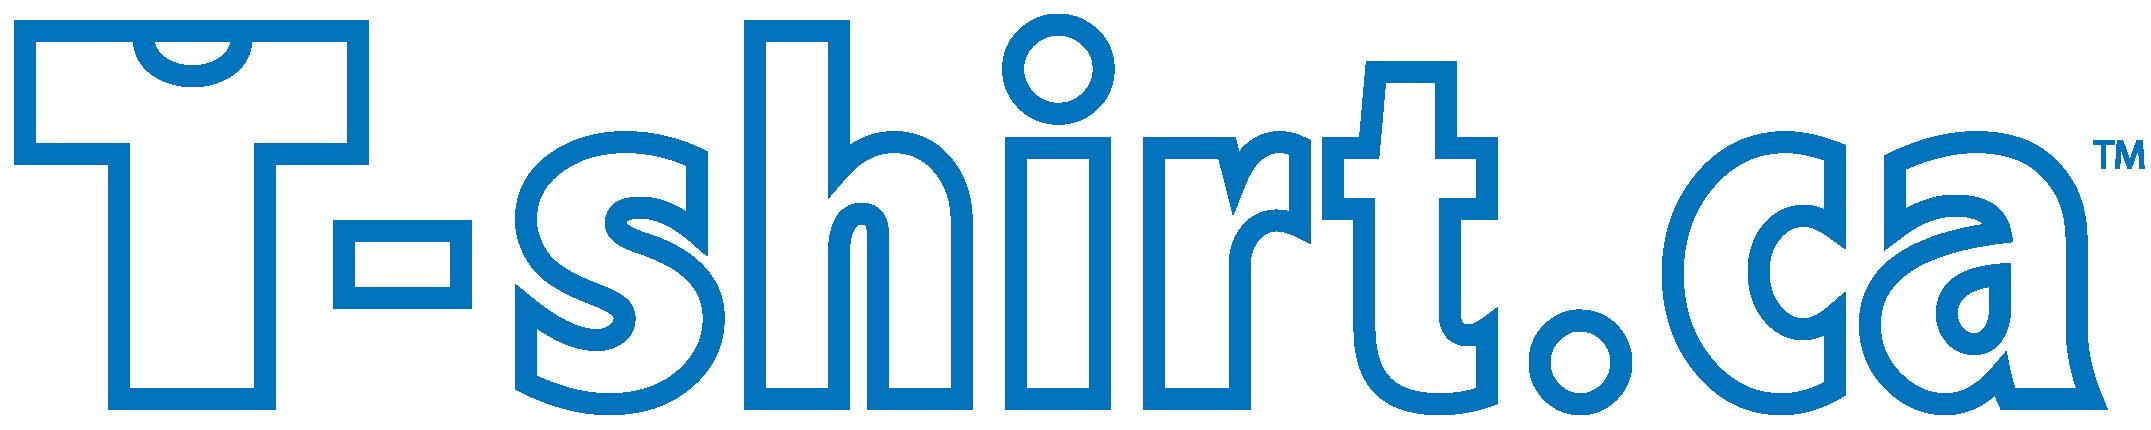 new-t-logo-2014-big.jpg